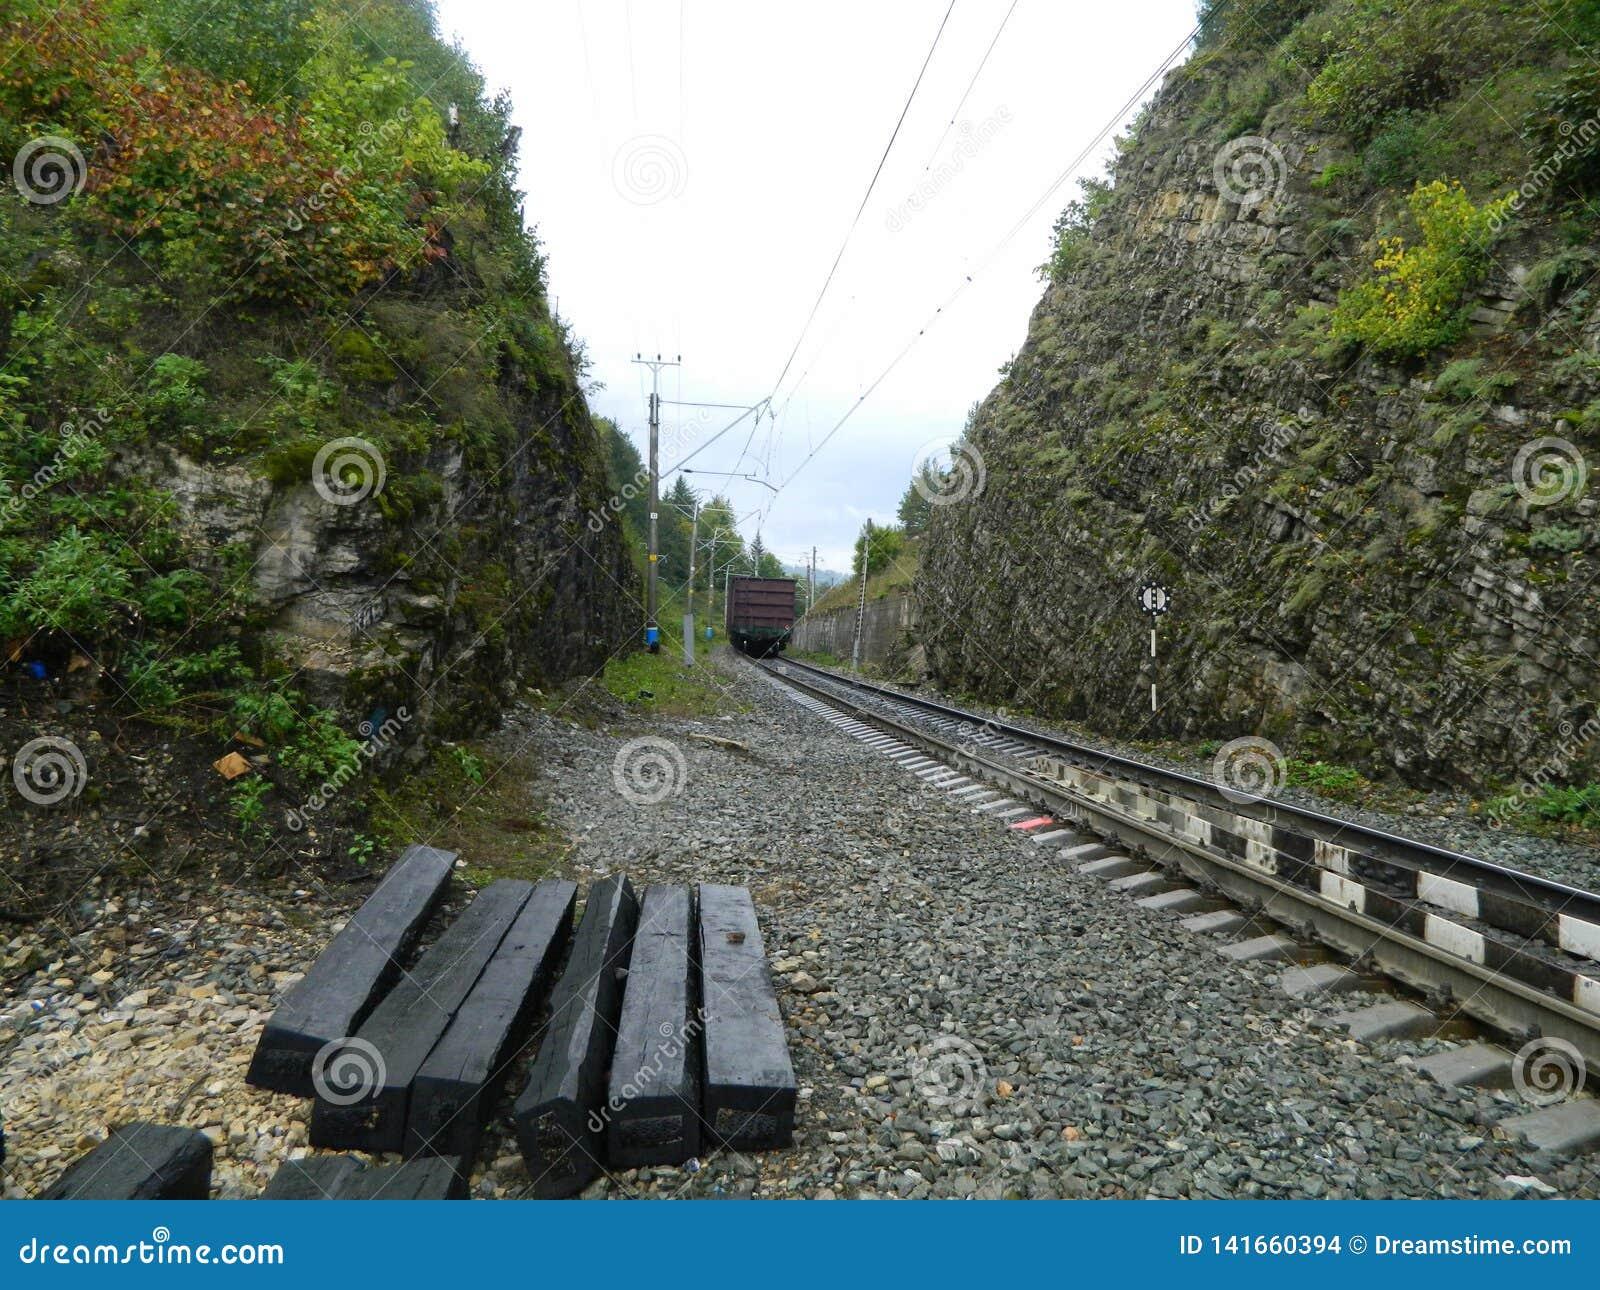 The railway after a rain